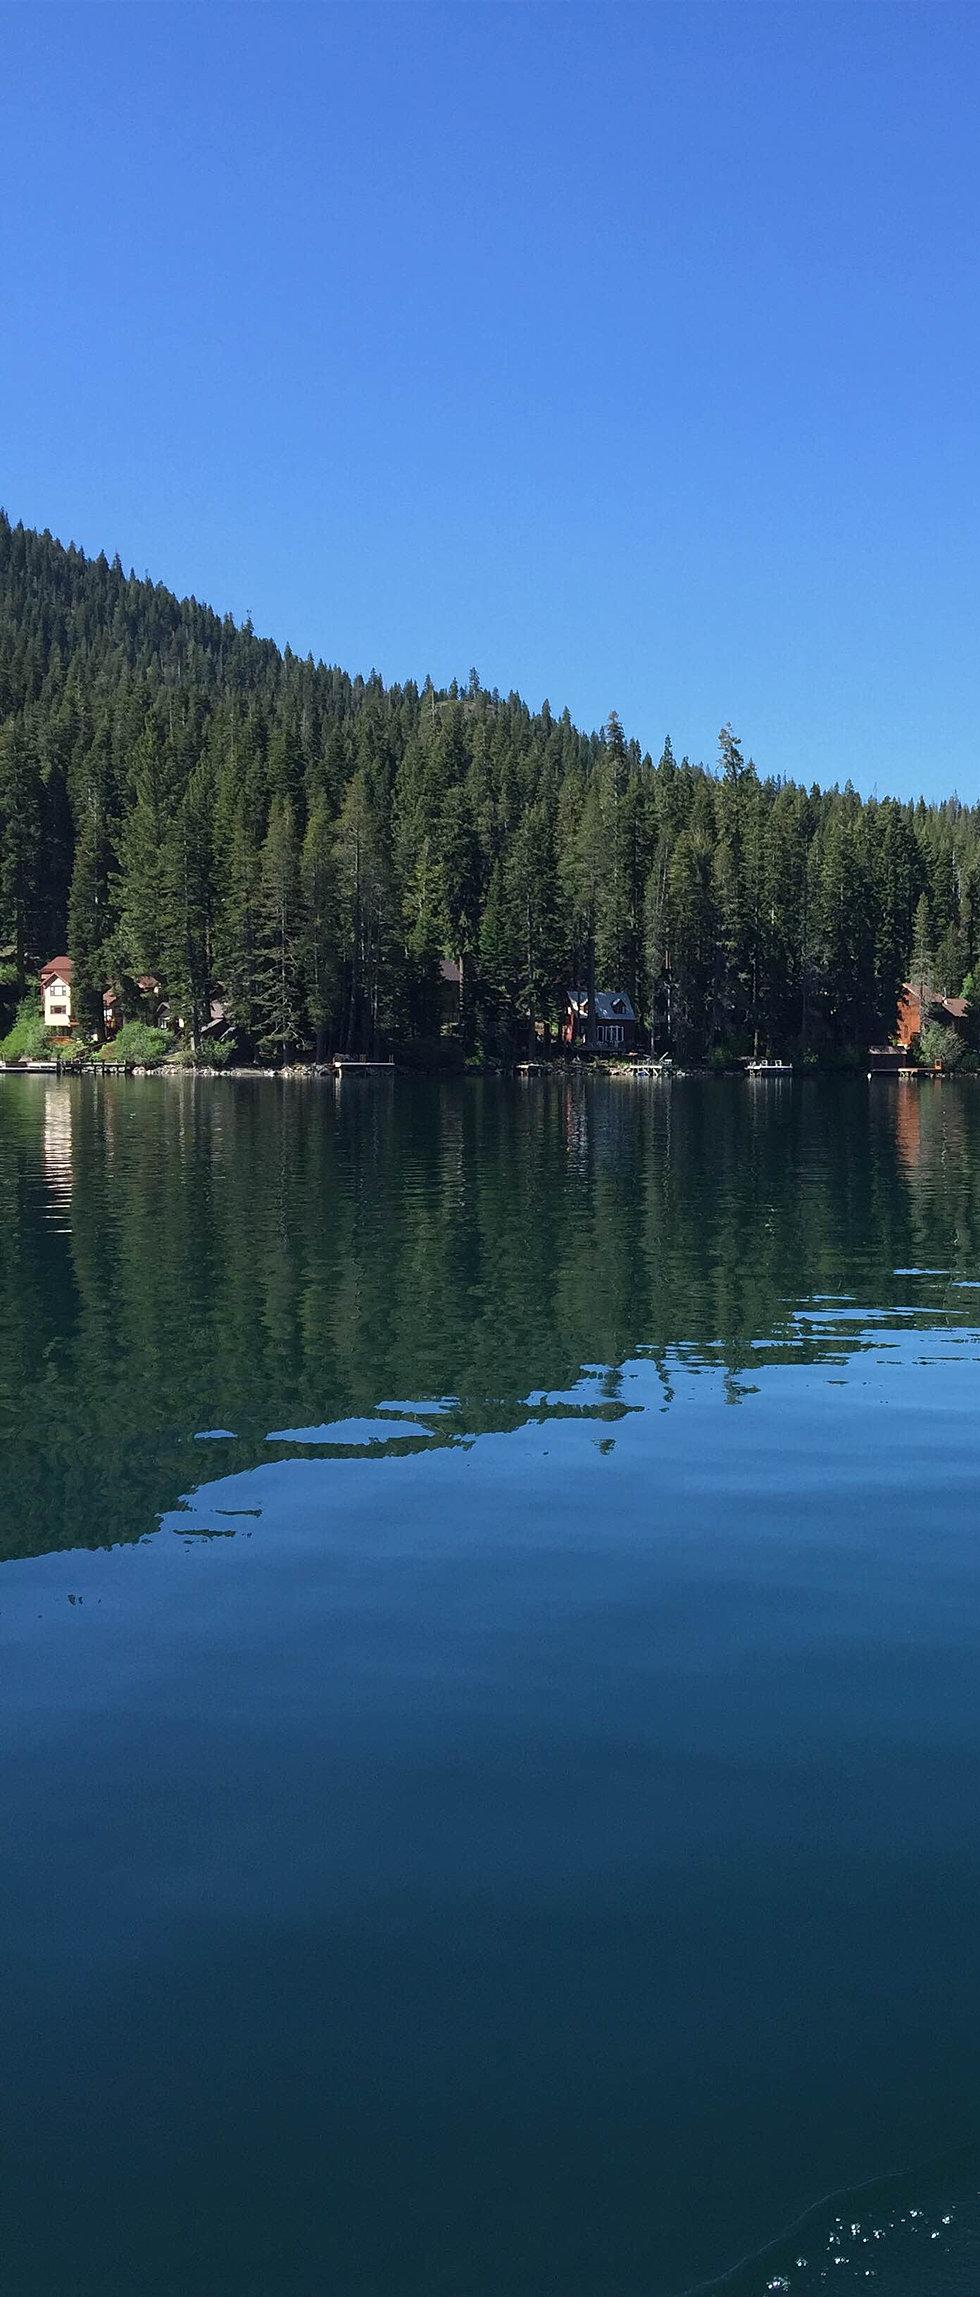 Tahoe donner boat rental for Donner lake fishing report